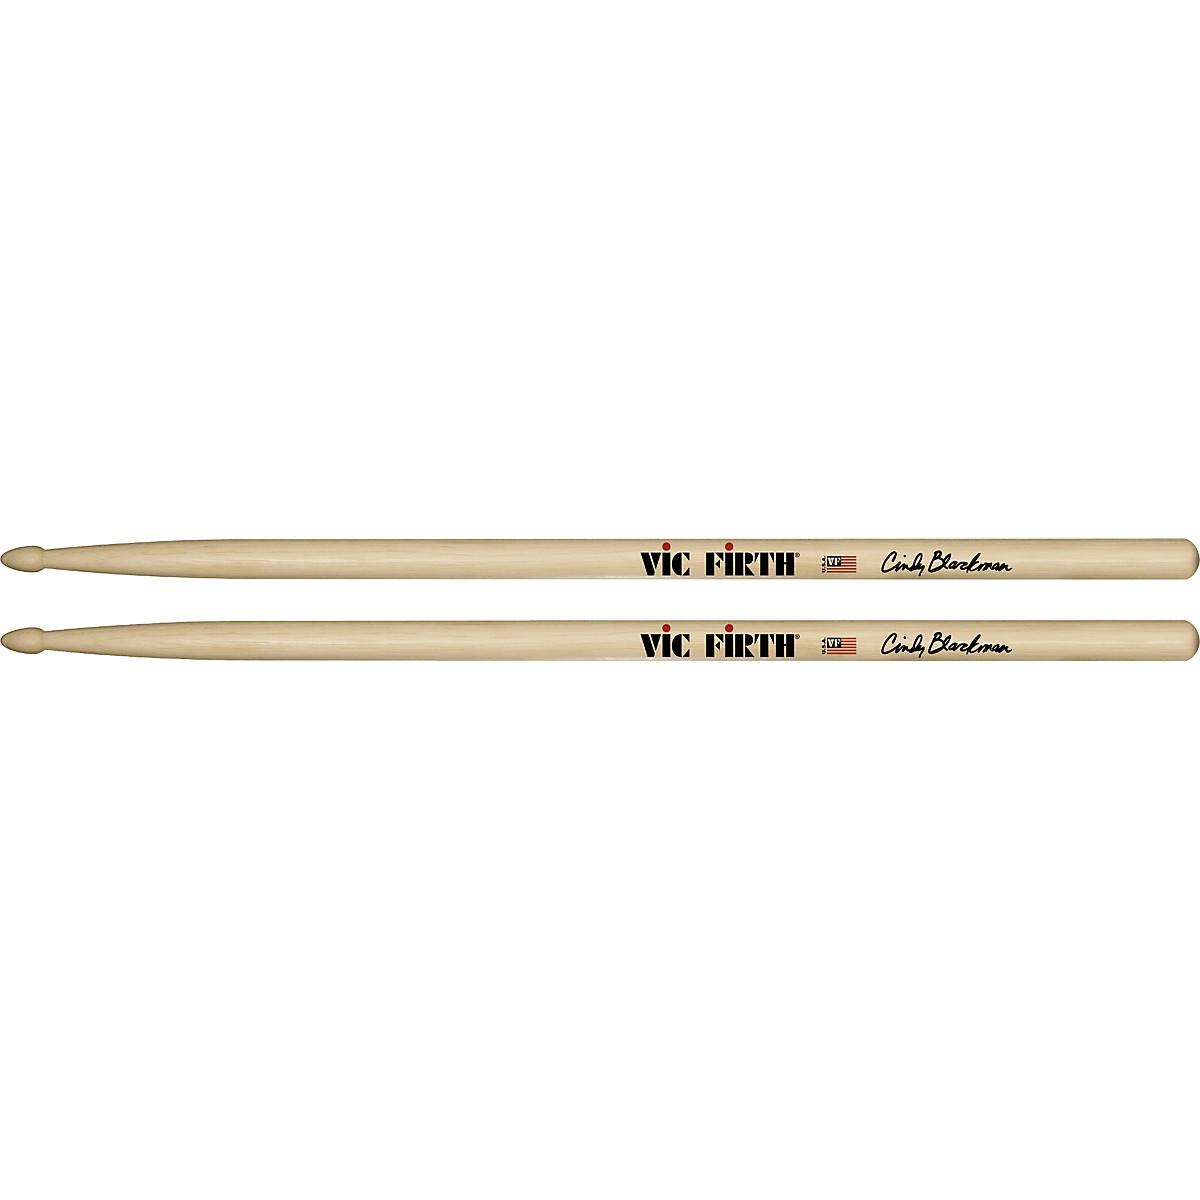 Vic Firth Cindy Blackman Signature Drumsticks